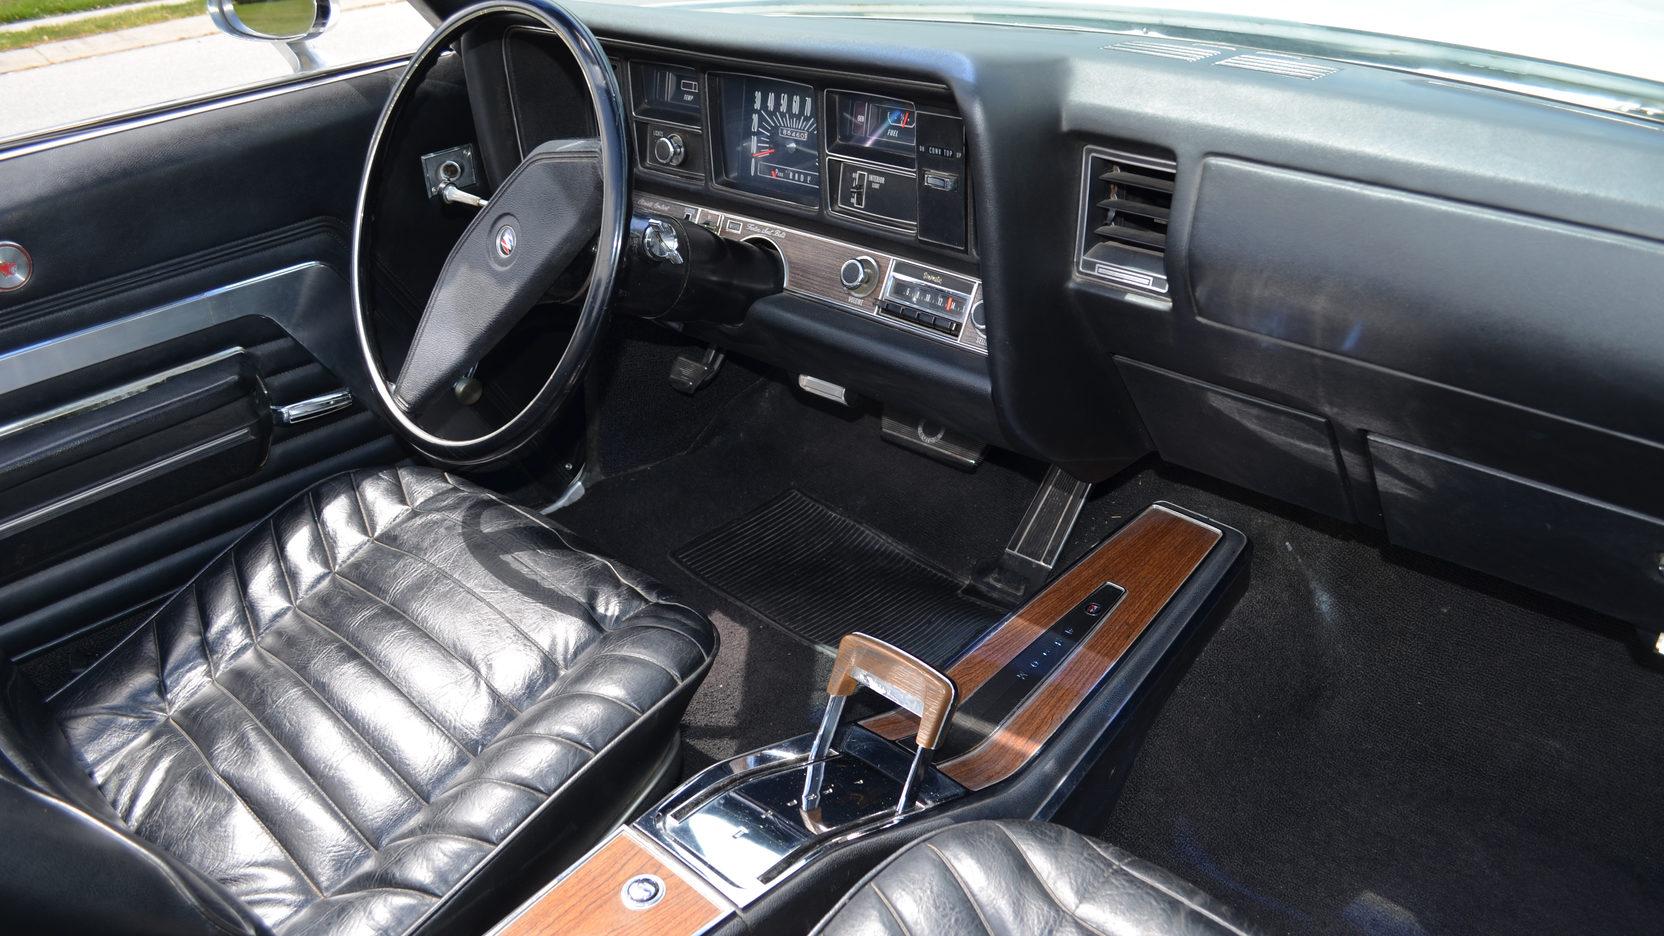 1970 Buick Wildcat interior dash